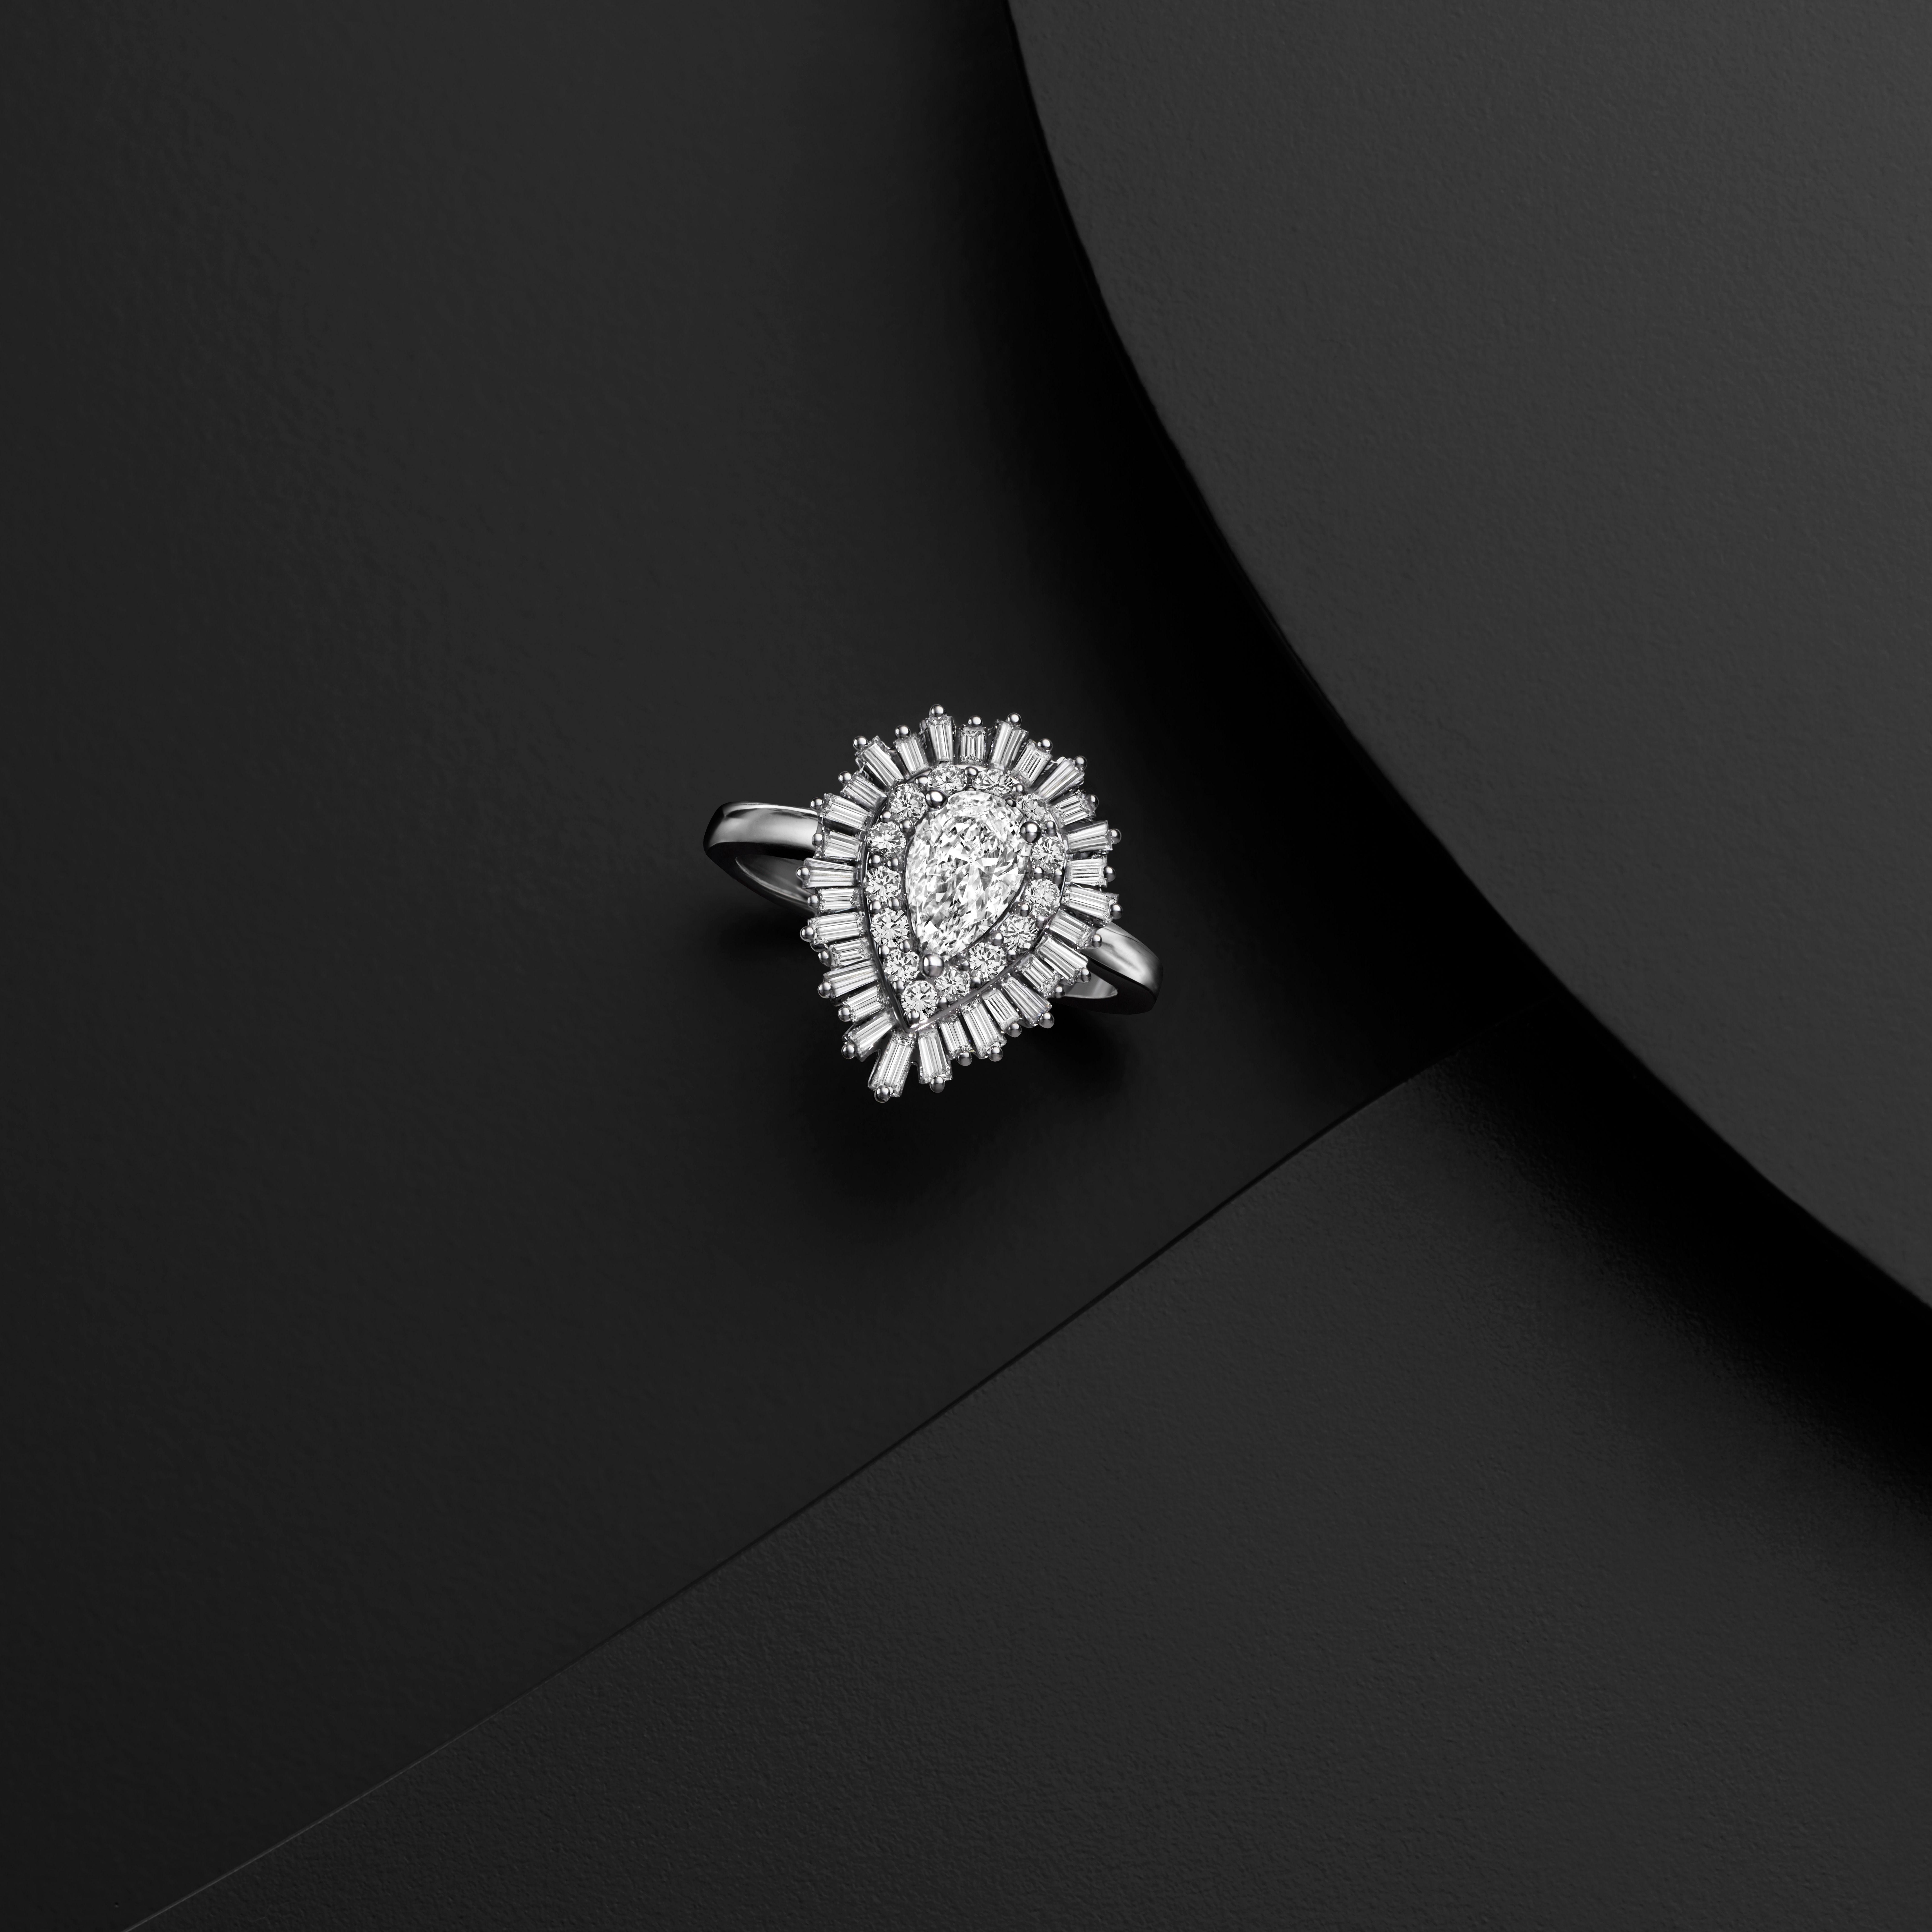 33+ Pear shaped wedding ring zales ideas in 2021